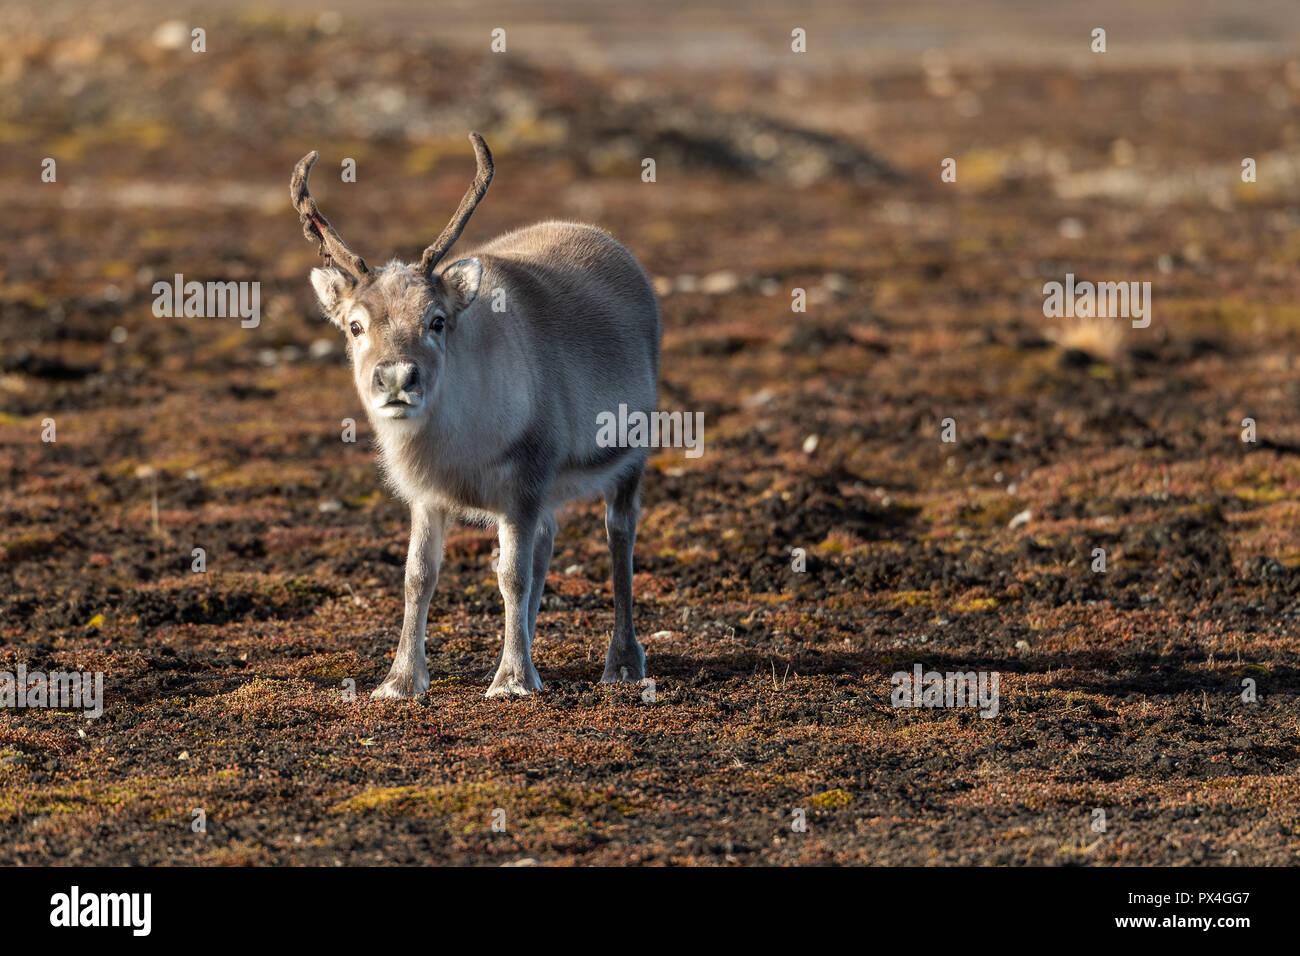 Svalbard reindeer (Rangifer tarandus platyrhynchus), Spitsbergen Archipelago, Svalbard and Jan Mayen, Norway - Stock Image